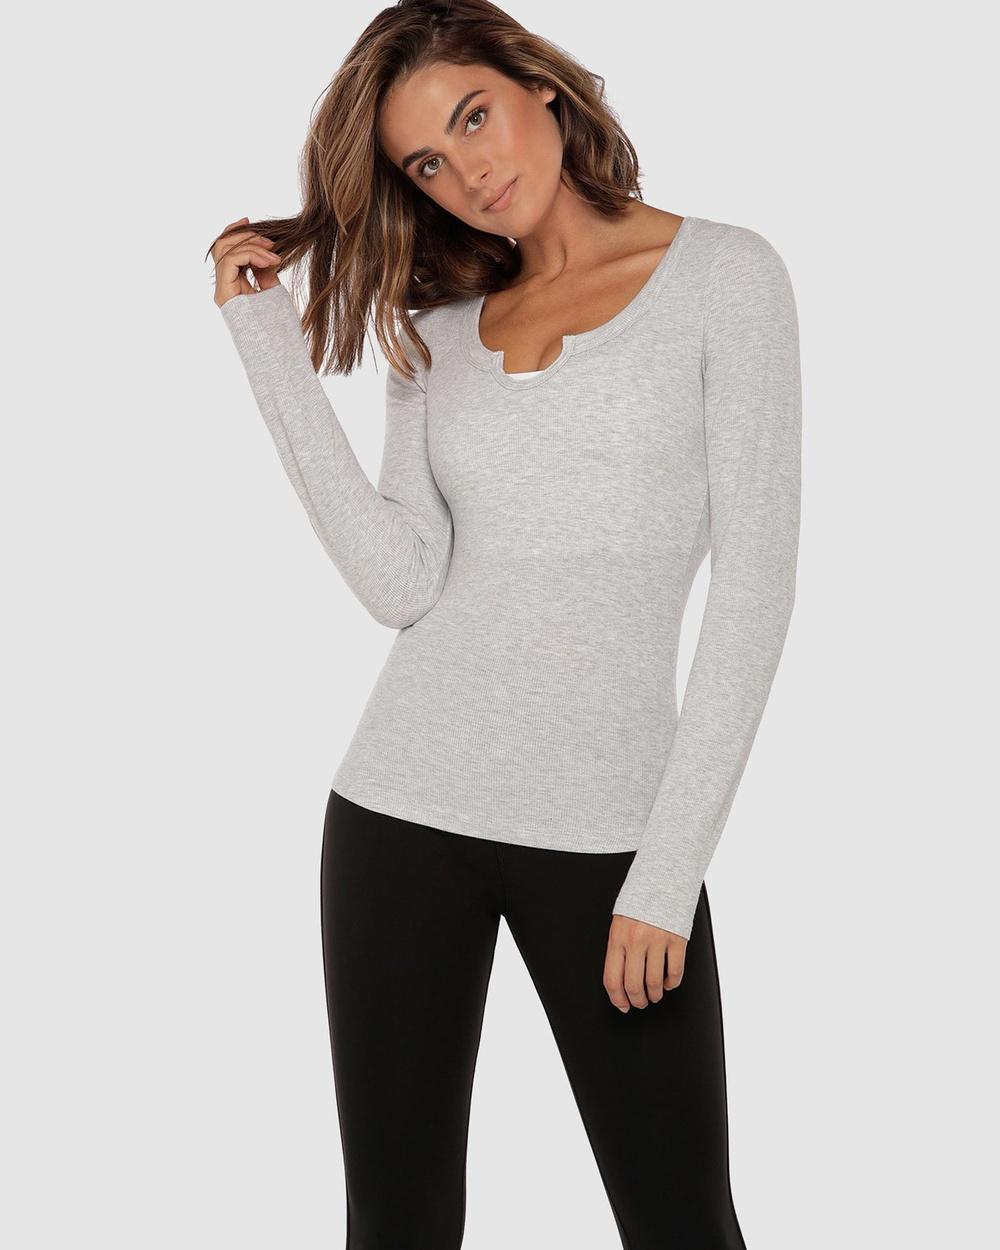 Lorna Jane - Serene Long Sleeve Top - Long Sleeve T-Shirts (Light Grey Marle) Serene Long Sleeve Top